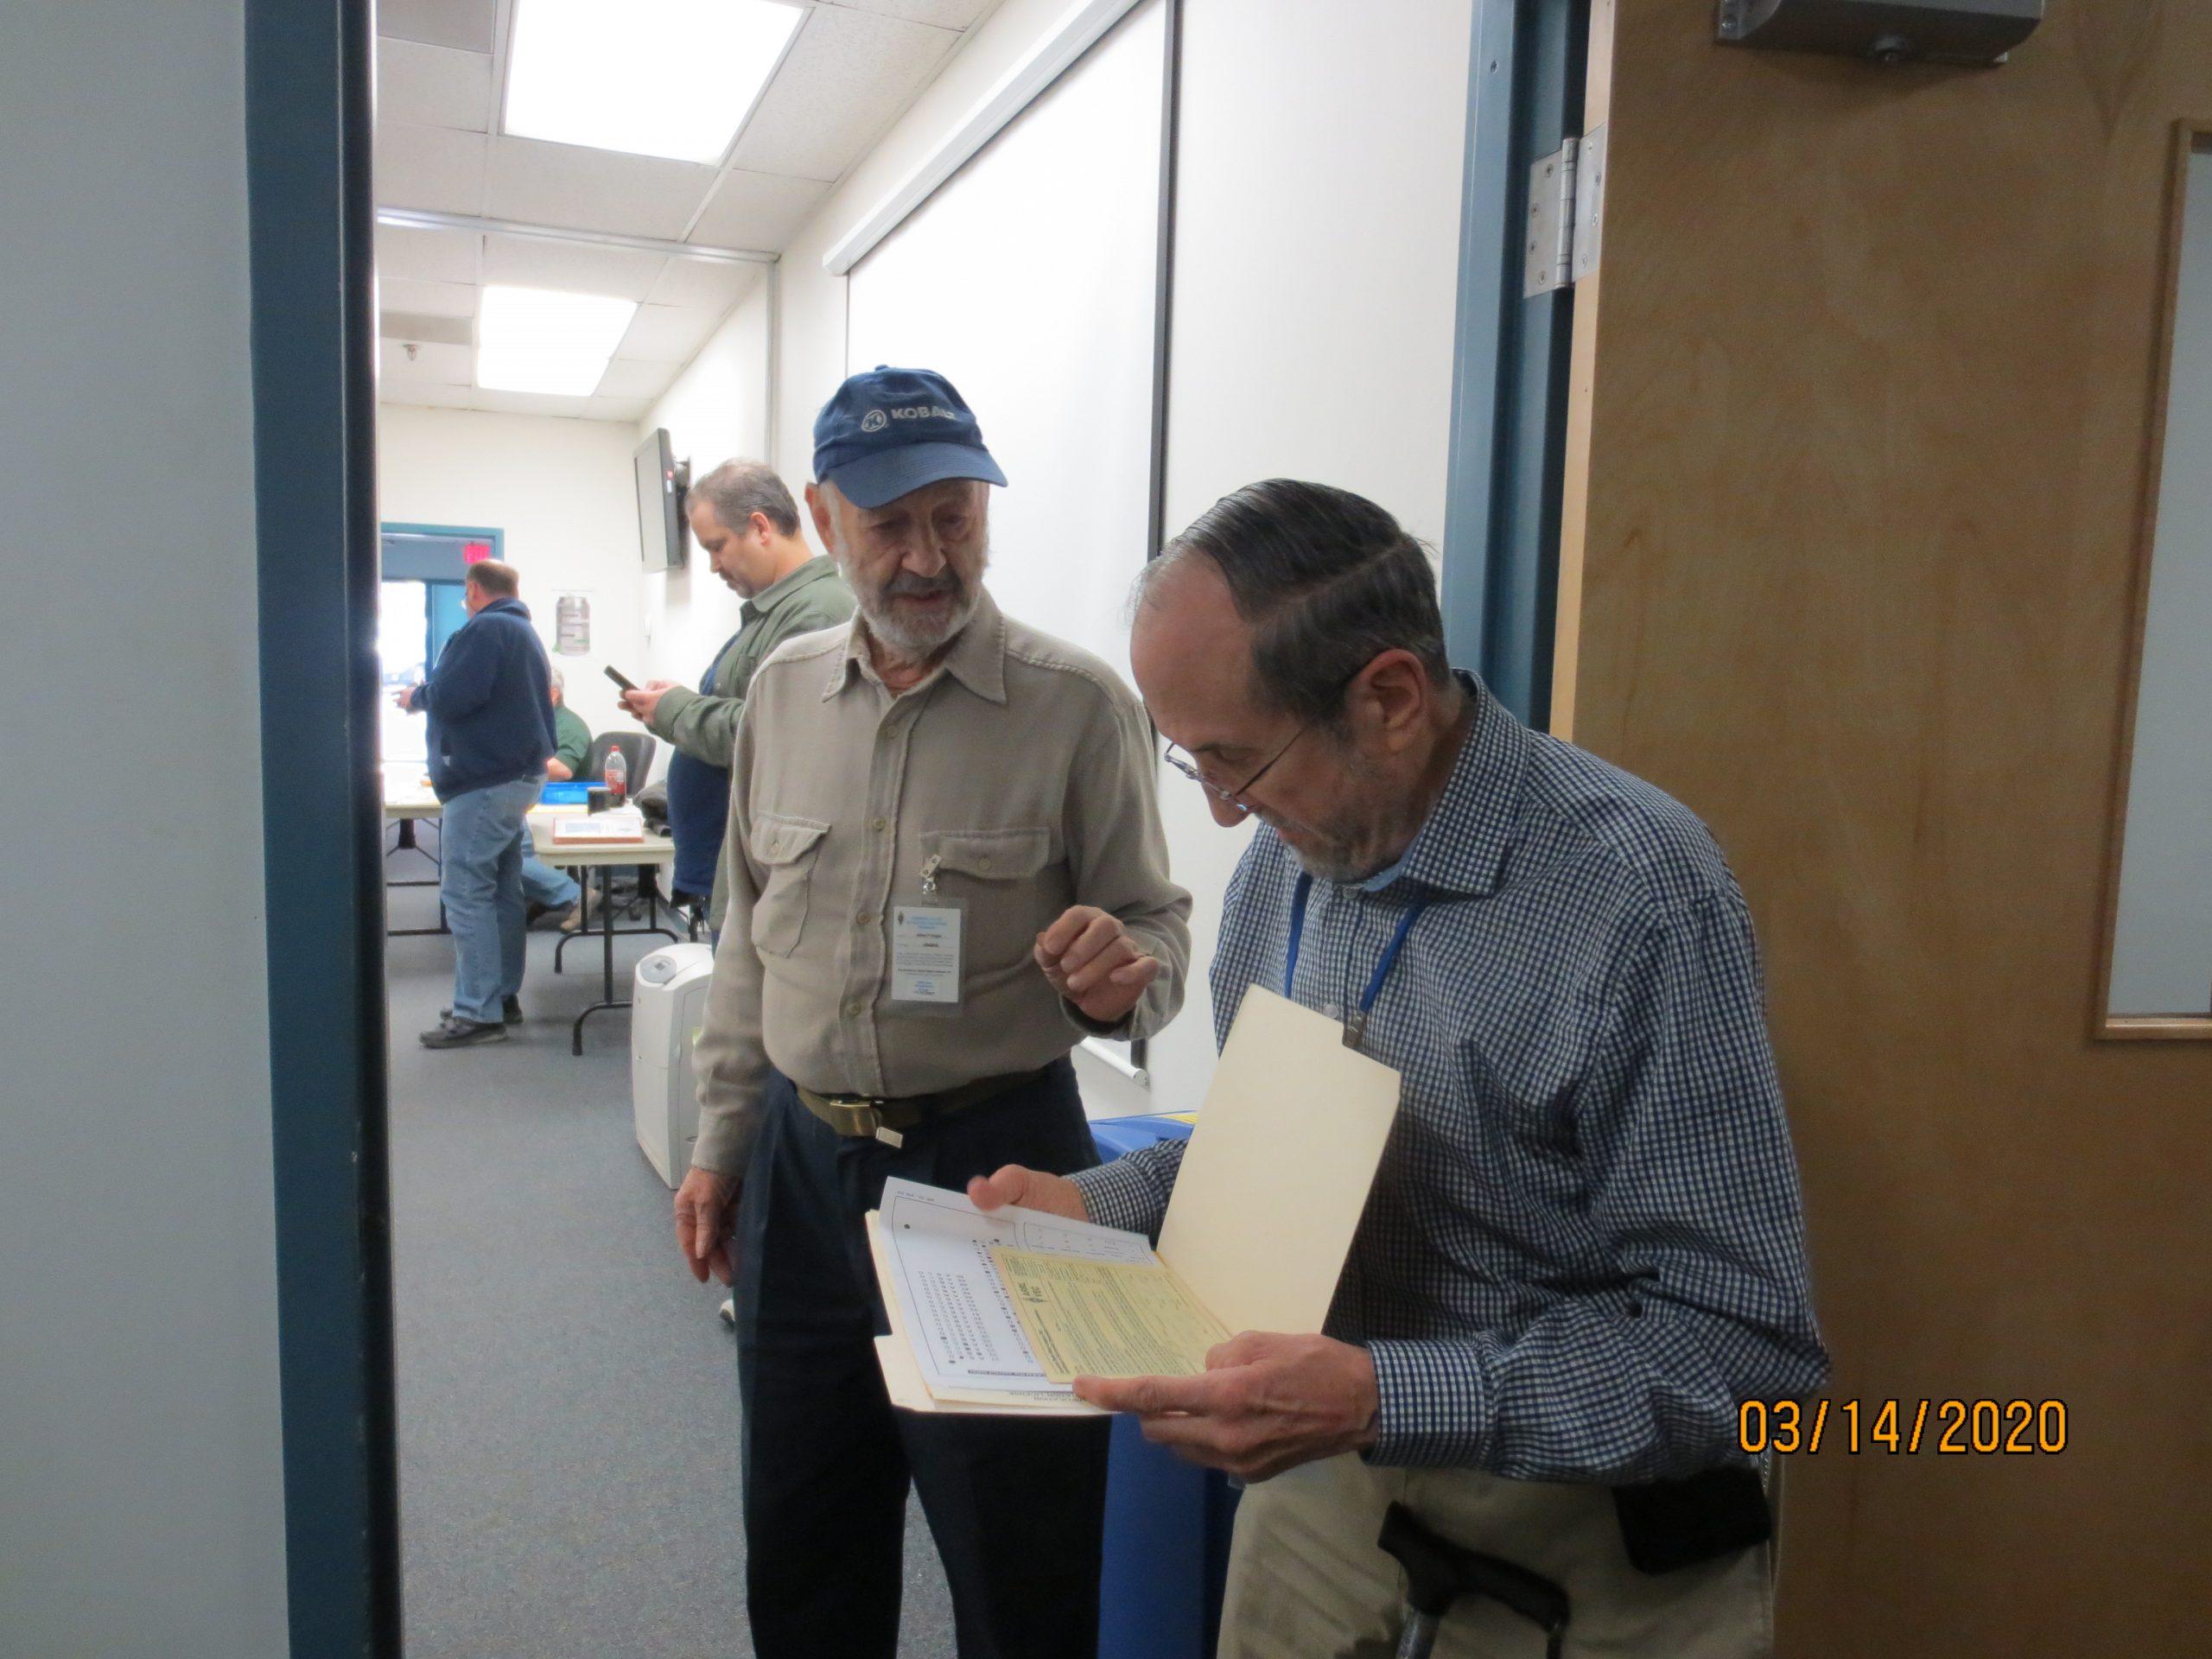 Luther, WA3FMO, checks exam paper work with AL, KB4BHB